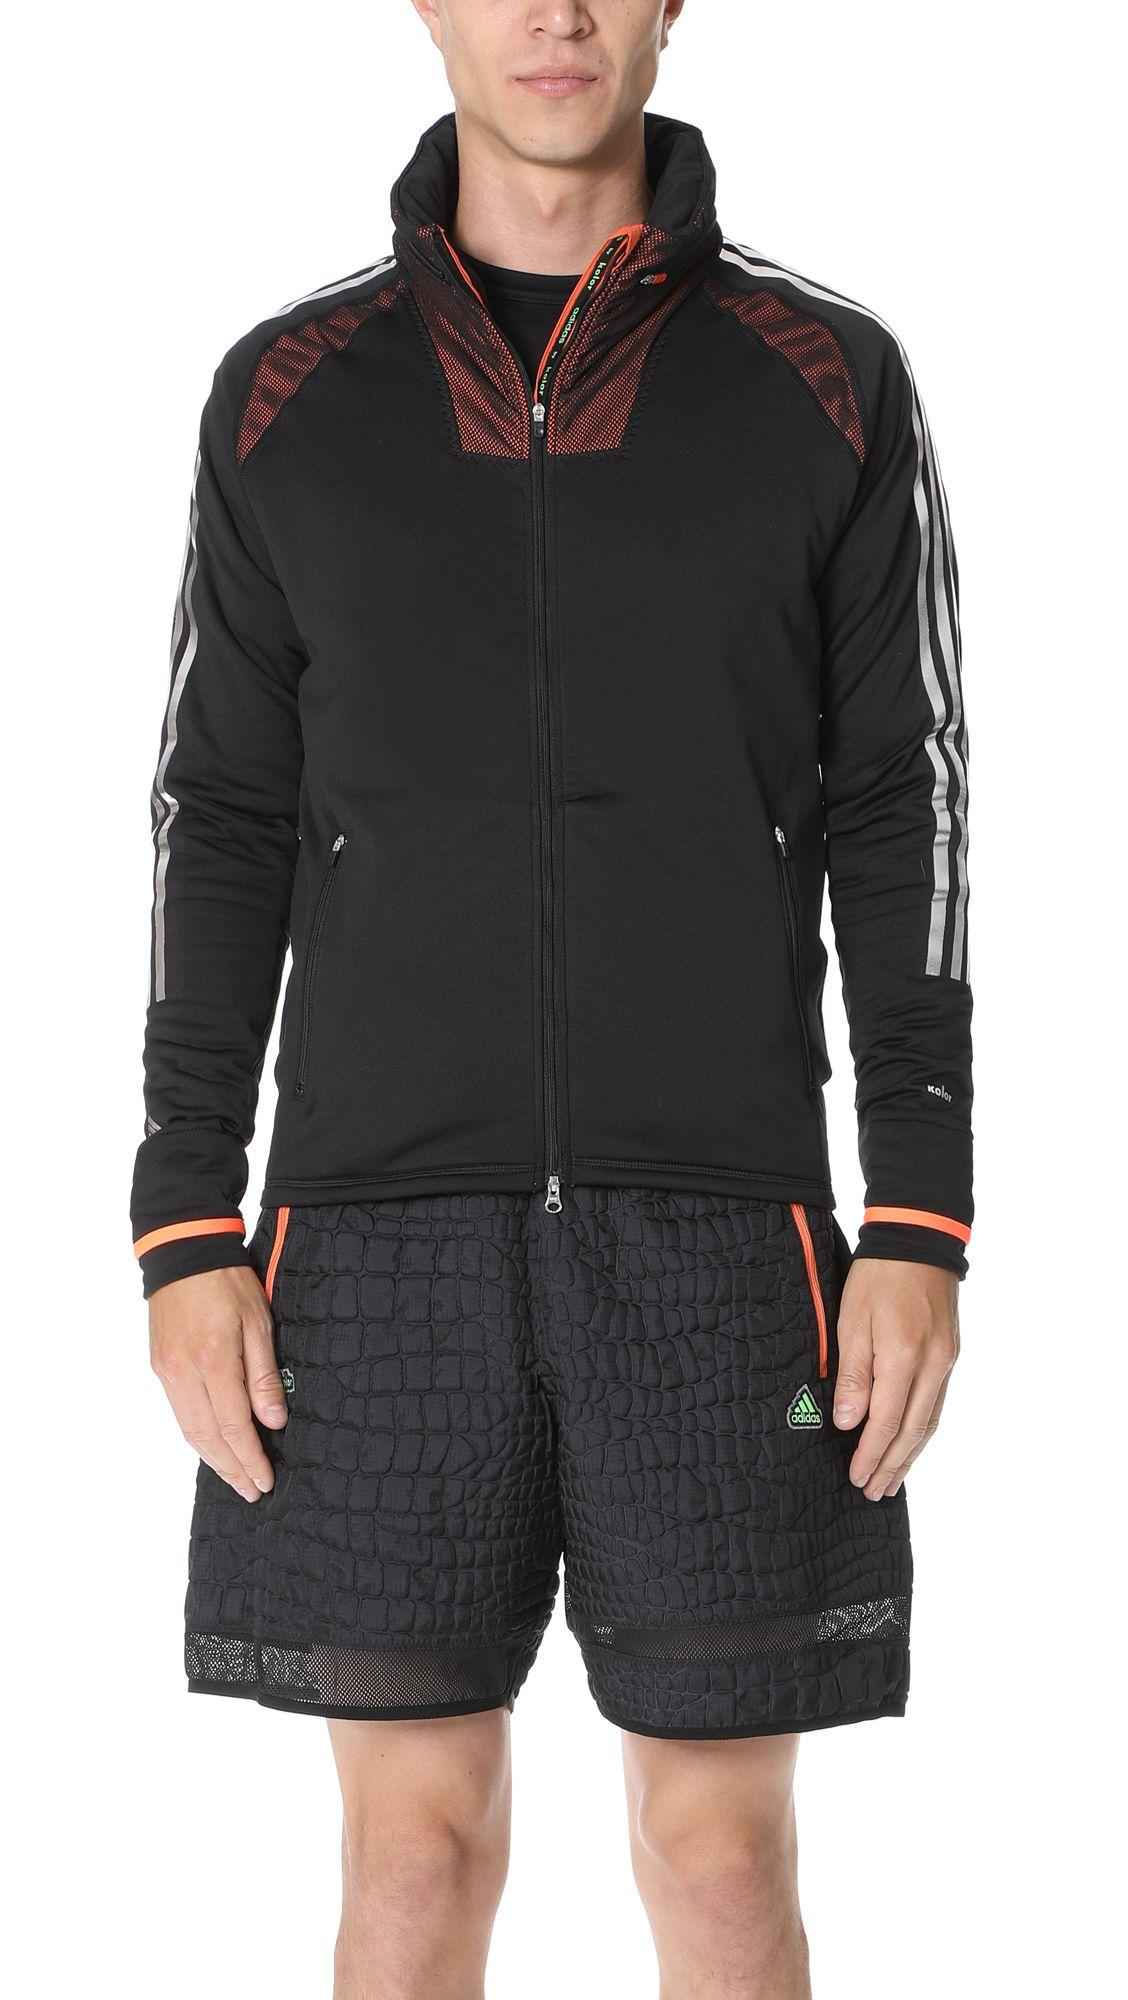 Adidas By Kolor Adidas By Kolor Climaheat Hoodie Adidasbykolor Cloth Hoodies Black Mesh Top Fashion [ 2000 x 1128 Pixel ]